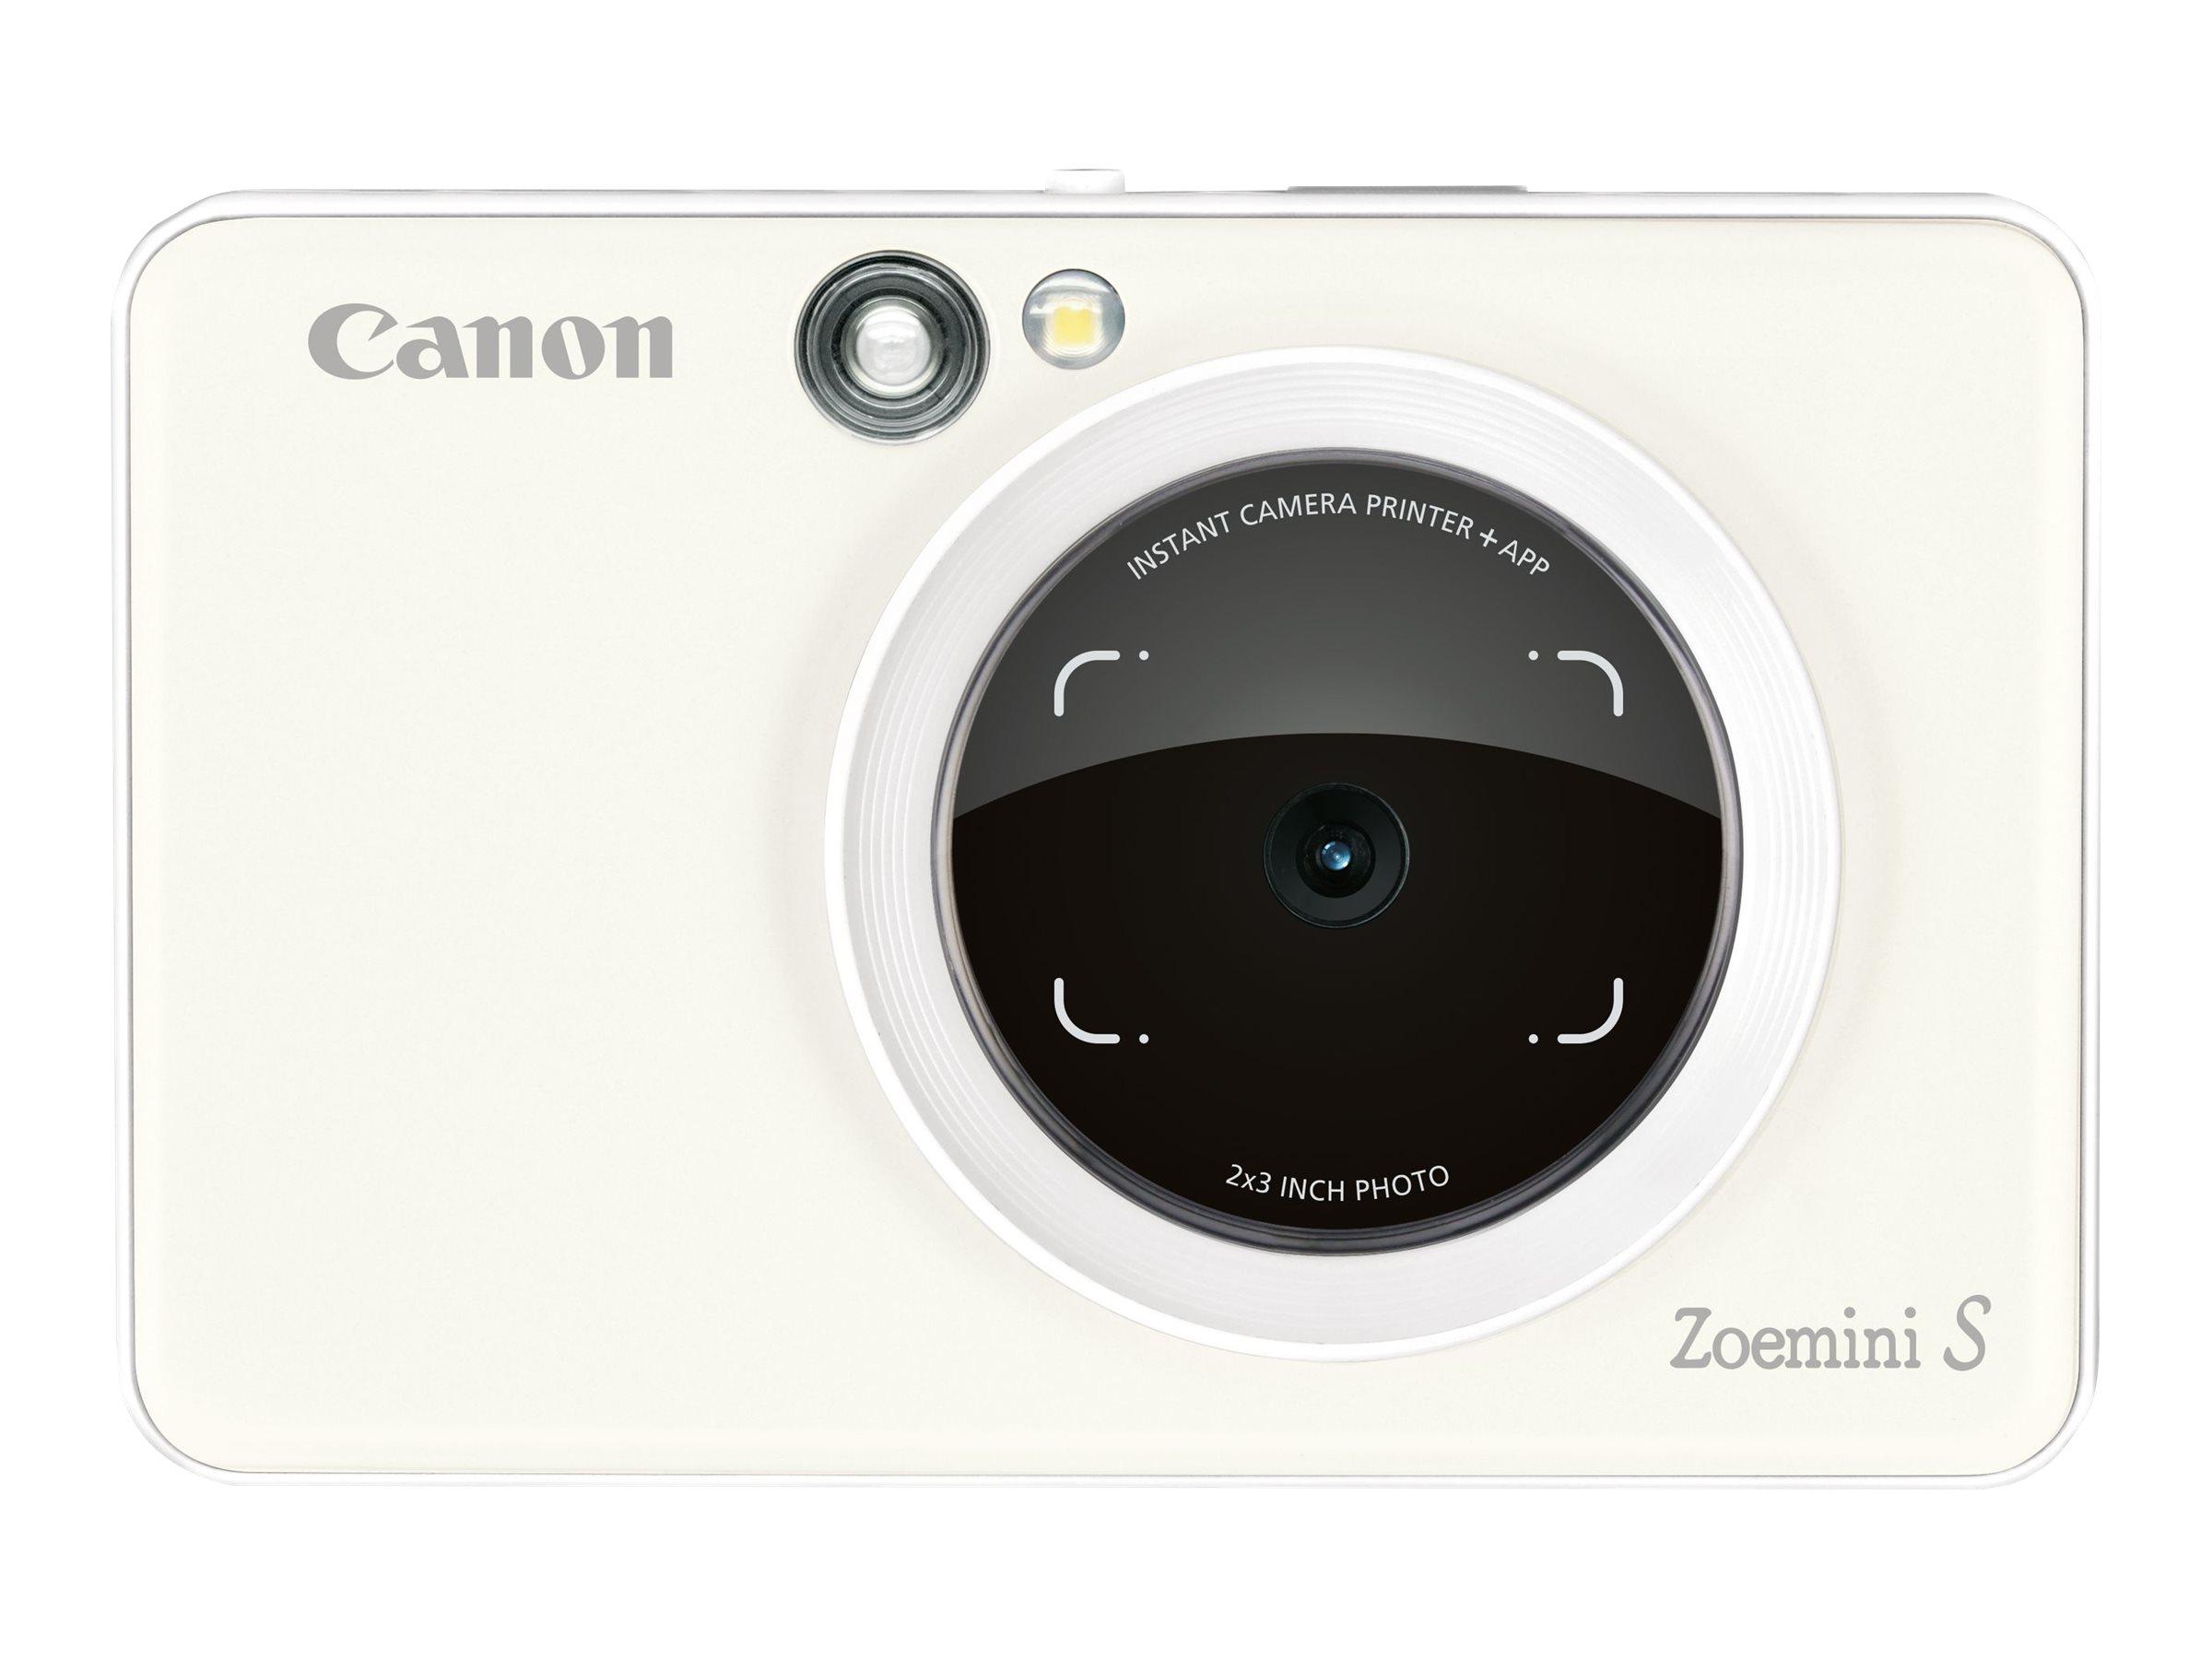 Canon Zoemini S - Digitalkamera - Kompaktkamera mit PhotoPrinter